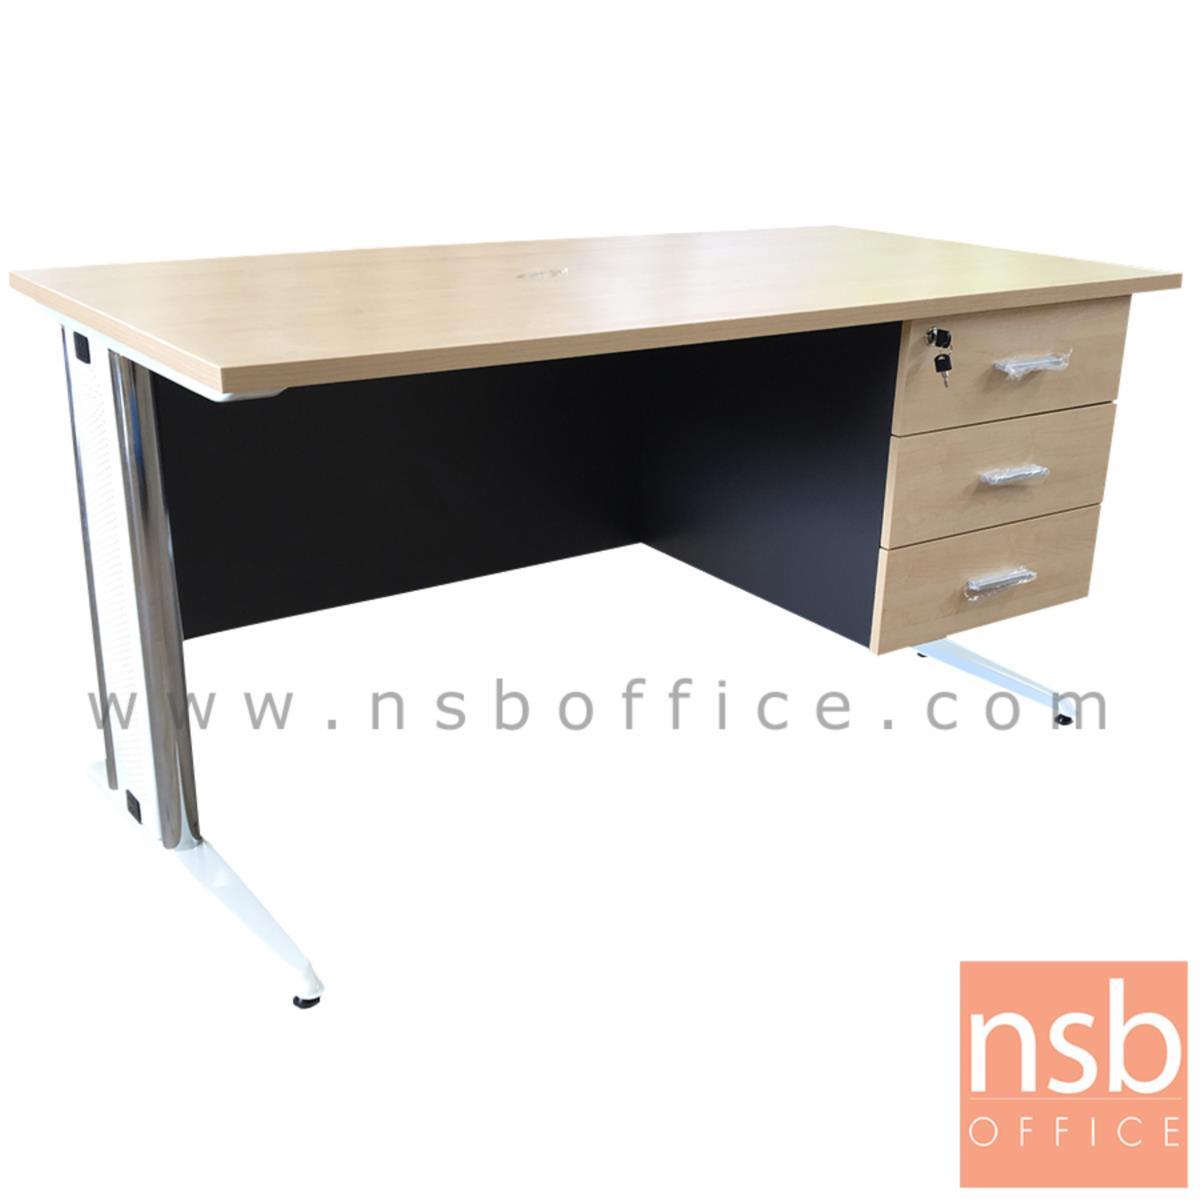 A18A002:โต๊ะทำงาน 3 ลิ้นชัก รุ่น Cliveden (คลิฟเดิน) ขนาด 120W, 135W, 150W (60D) cm.  ขาเหล็กตัวแอล